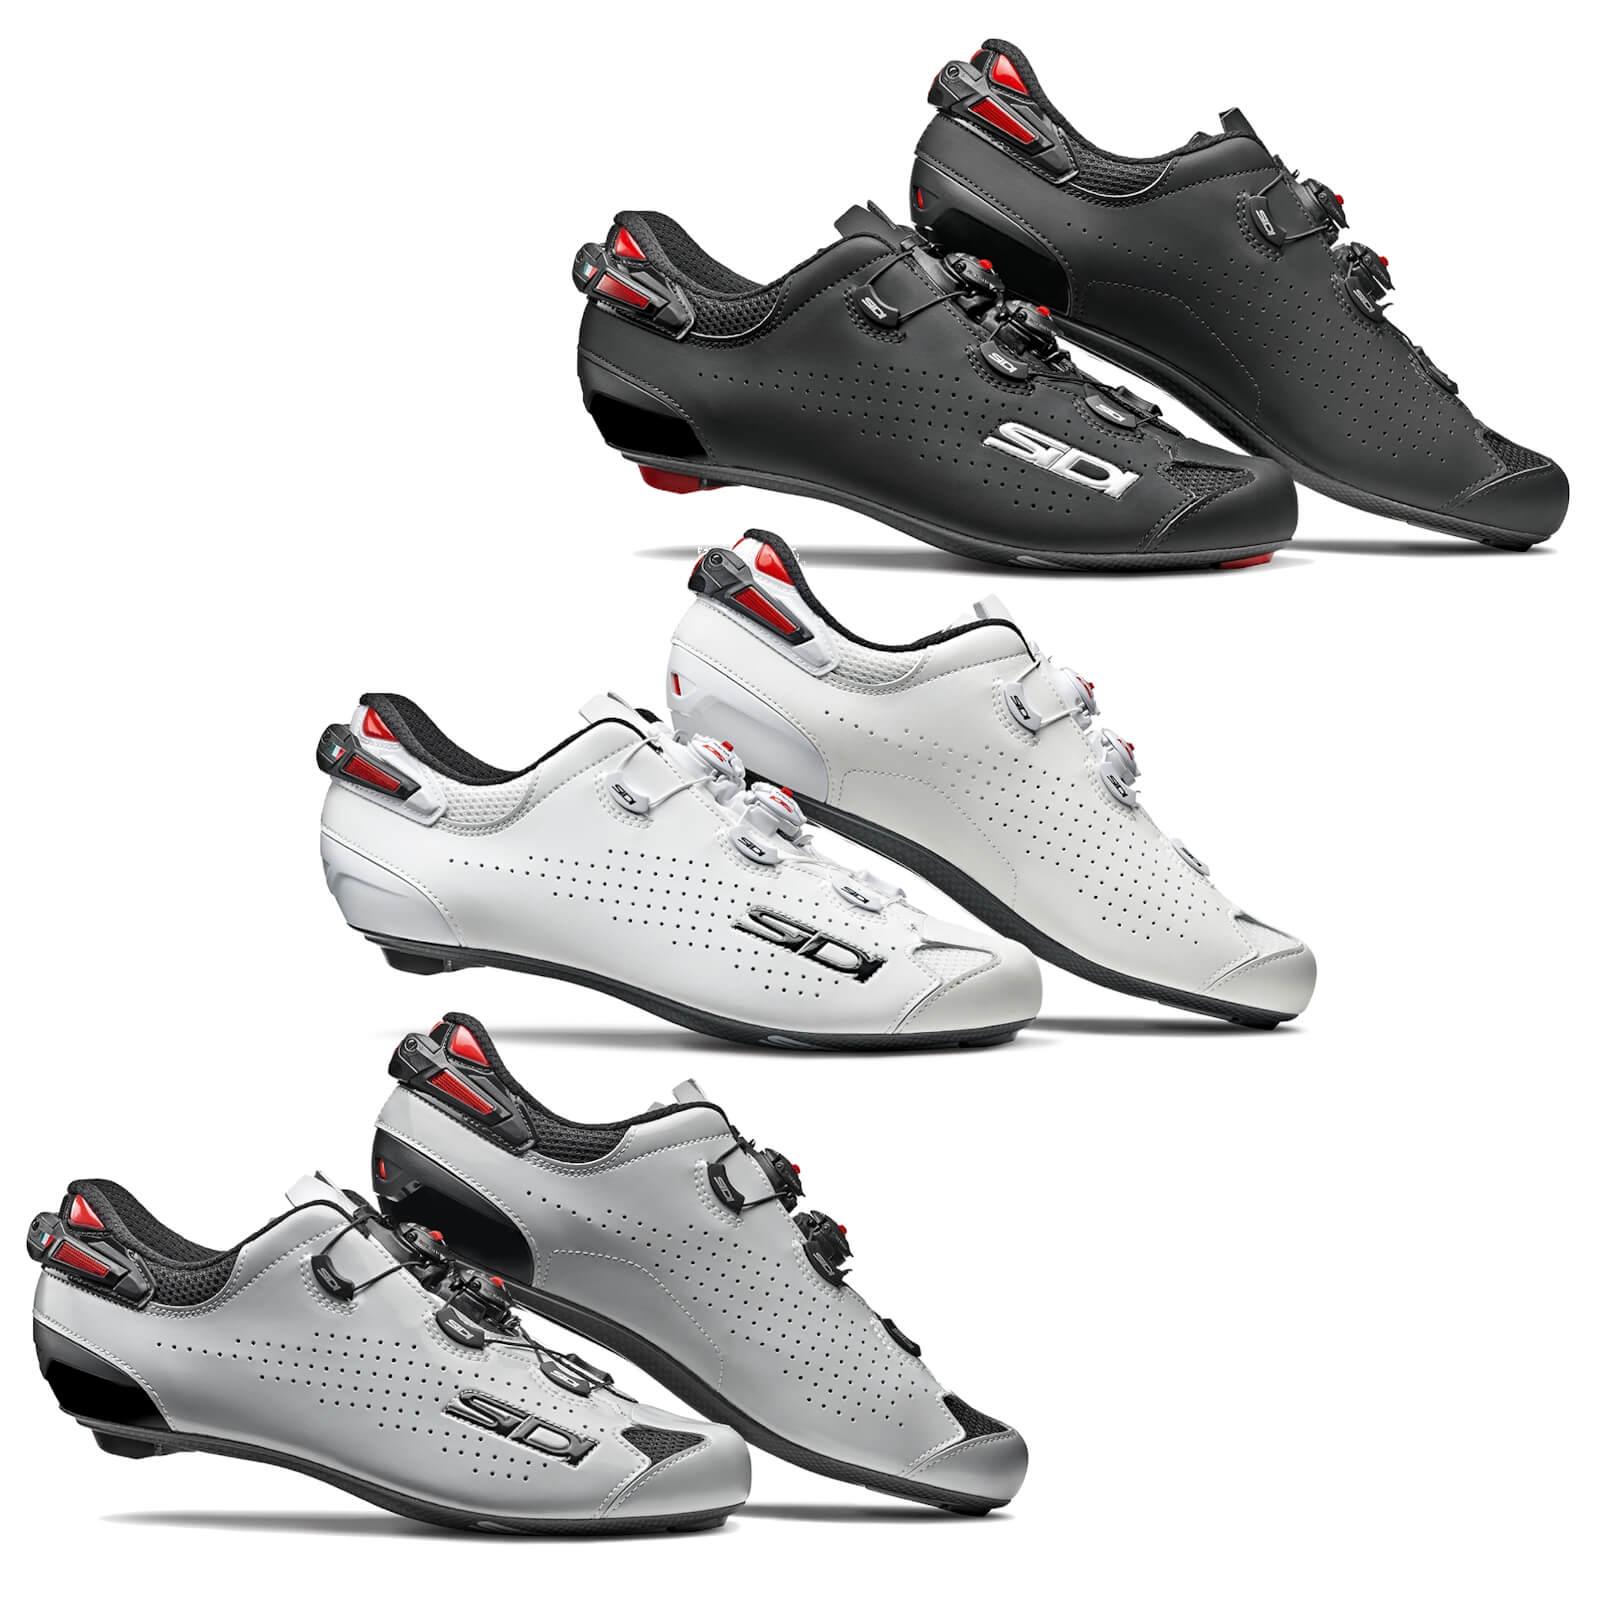 Sidi Shot 2 Carbon Road Shoes - EU 43.5 - Black/Black